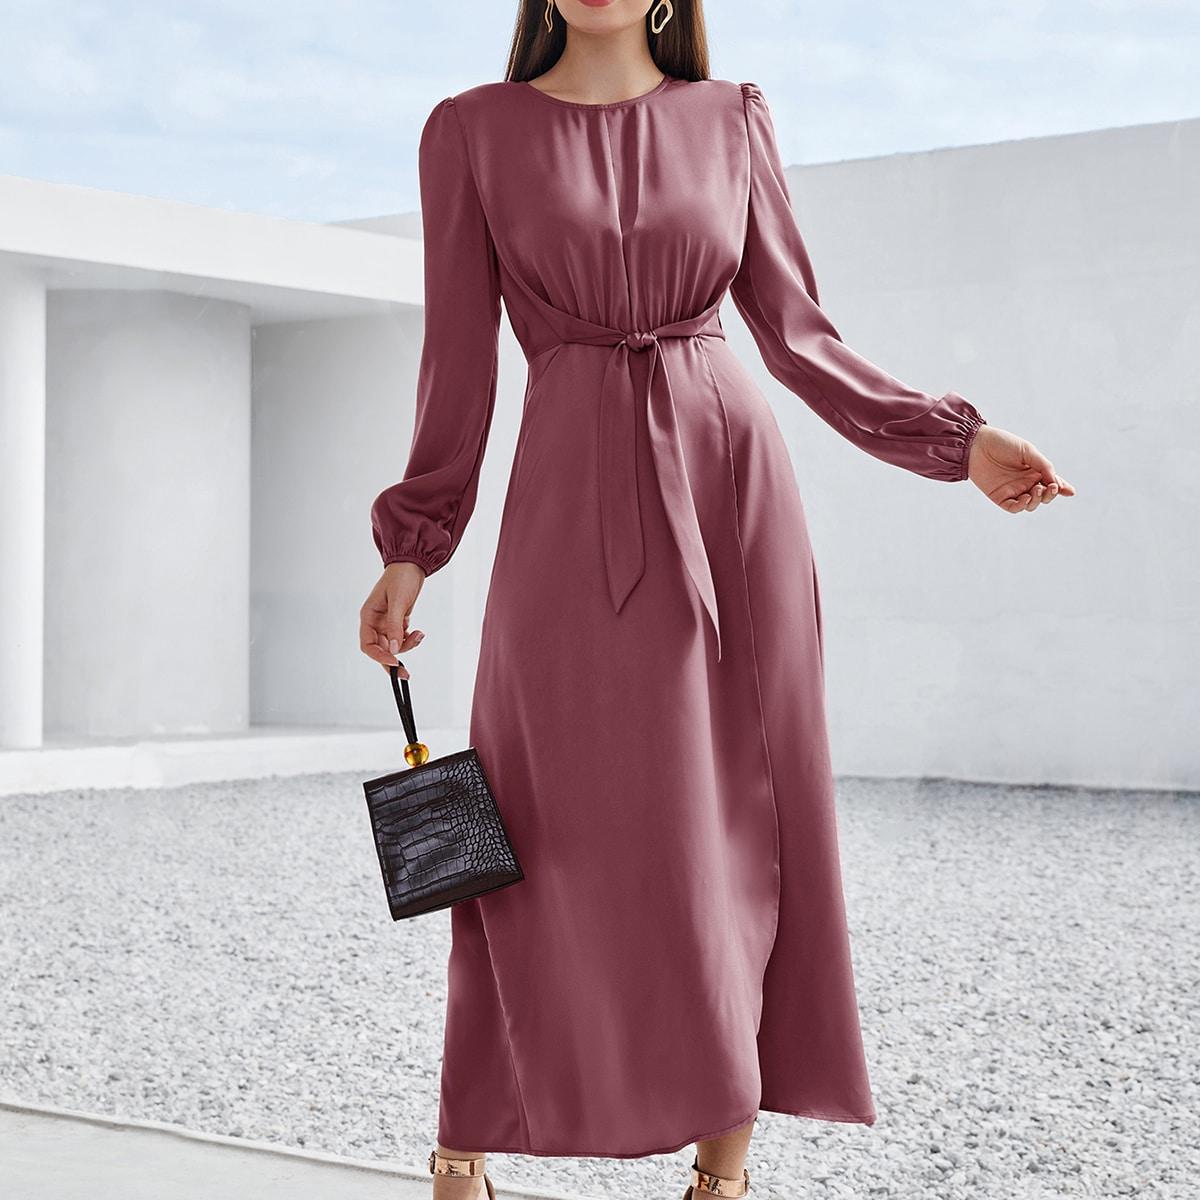 Solid Tie Front Wrap A-line Dress